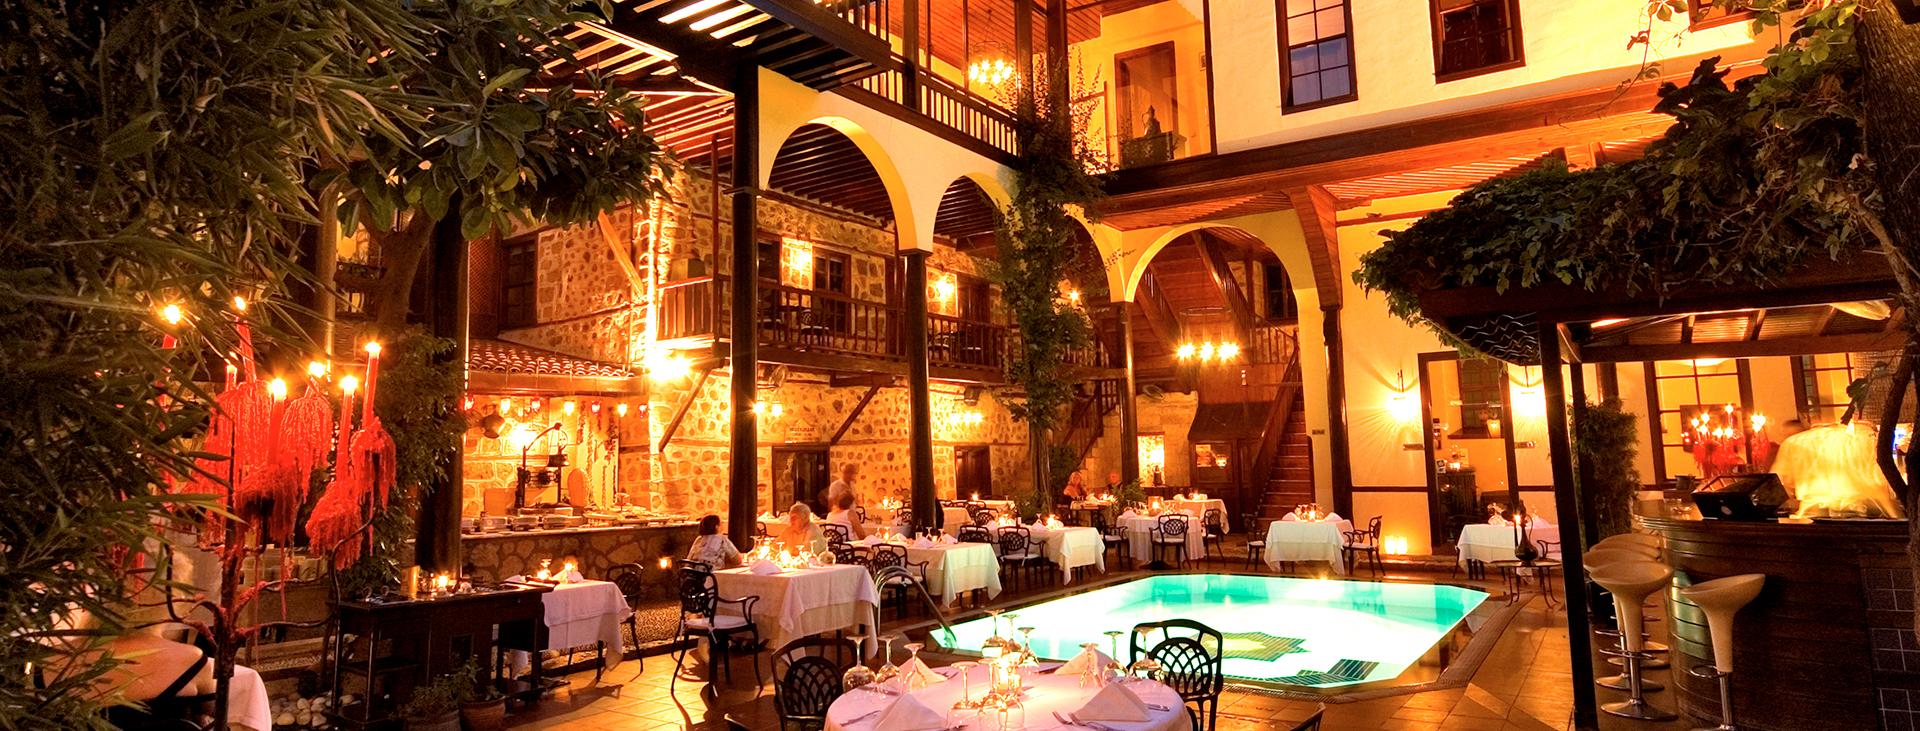 Alp Pasa Hotel, Antalya, Antalya-området, Turkiet